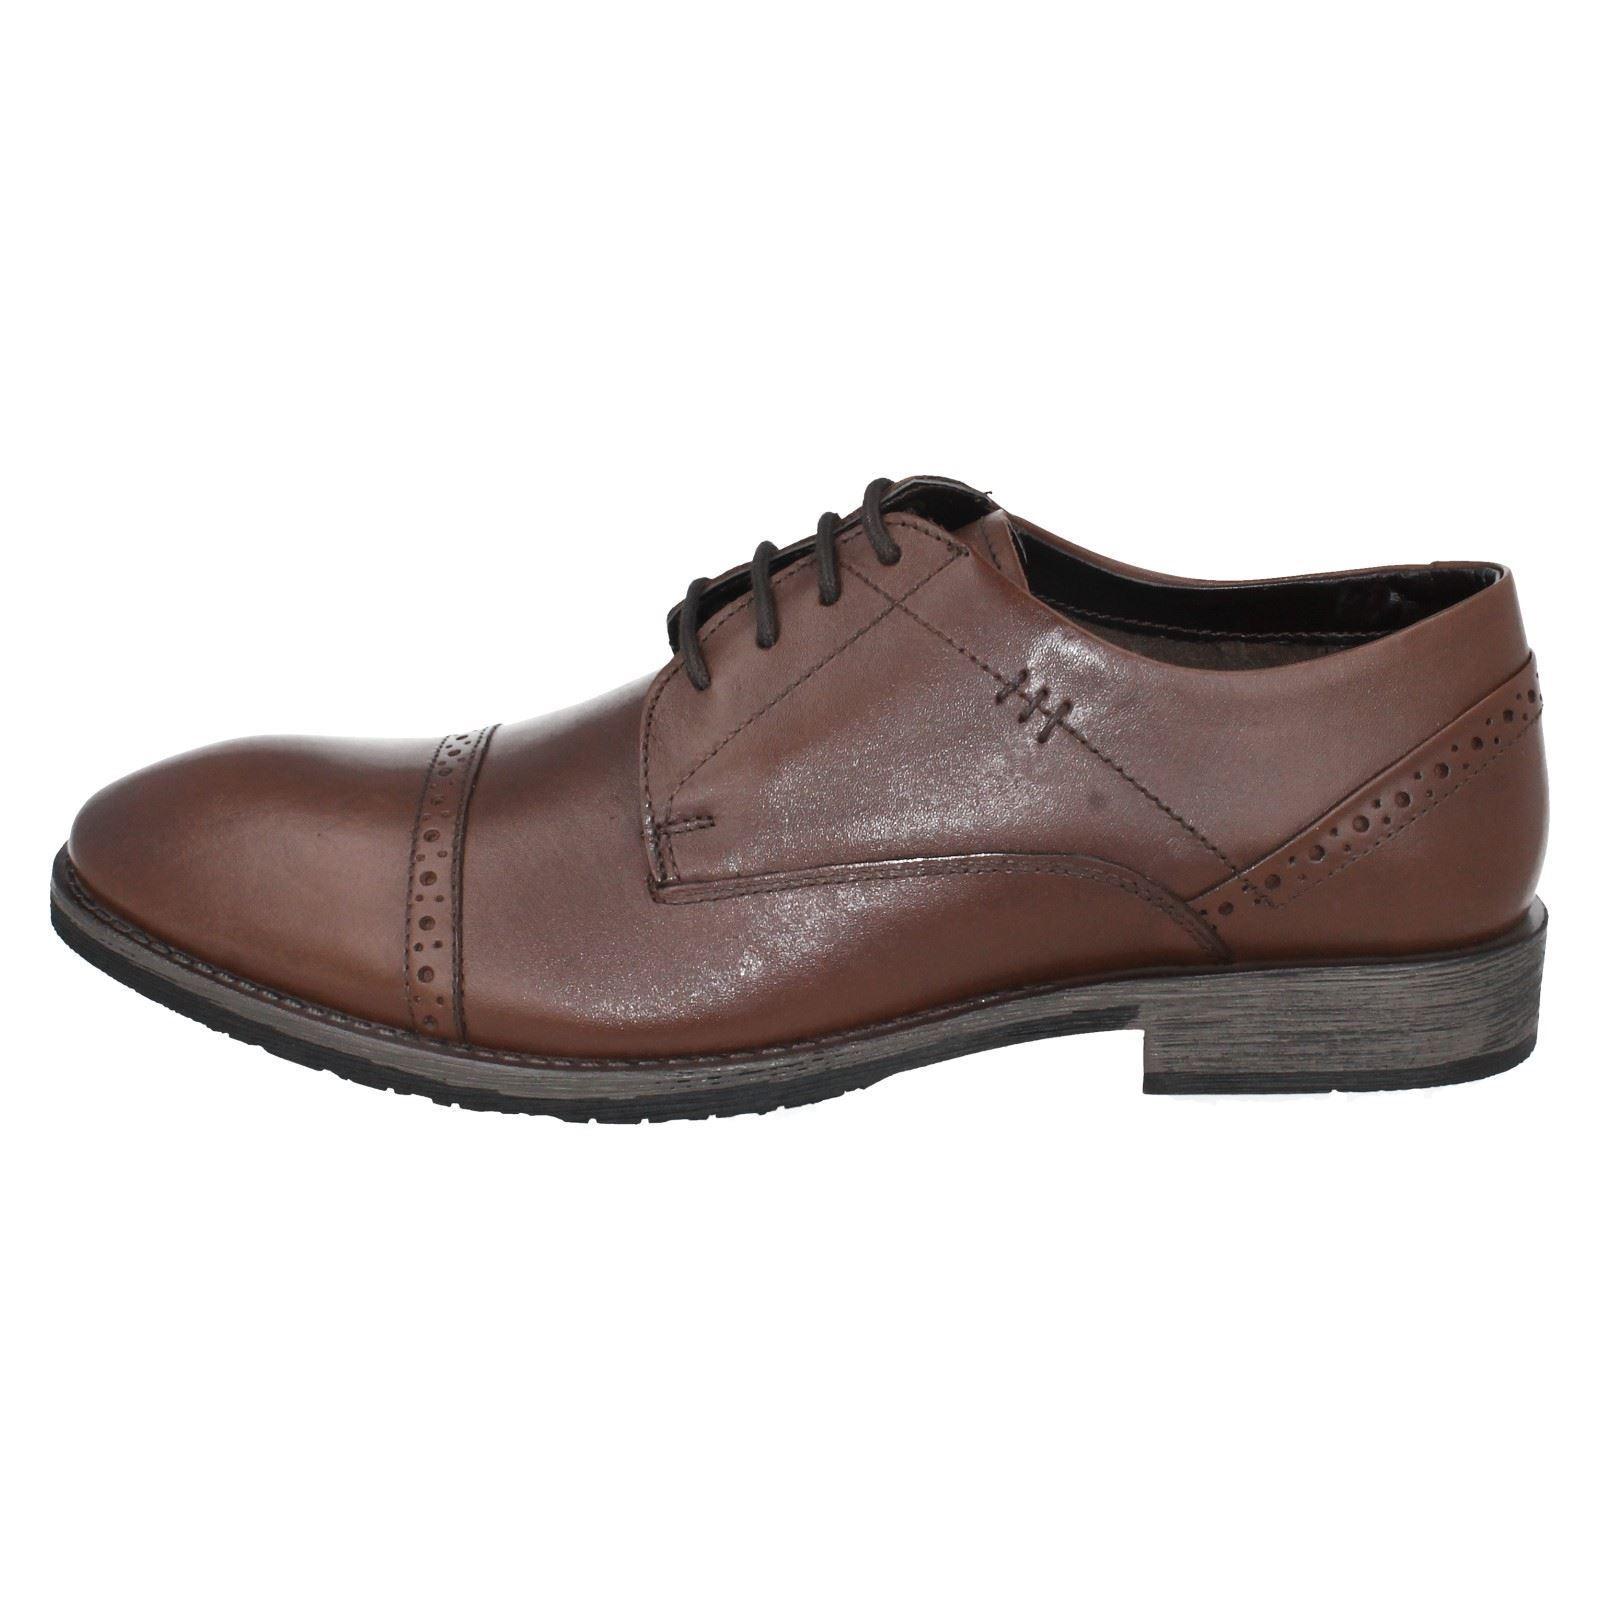 HUSH PUPPIES Craig Luganda  Up Uomo Braun Leder Lace Up  Schuhe 946b09